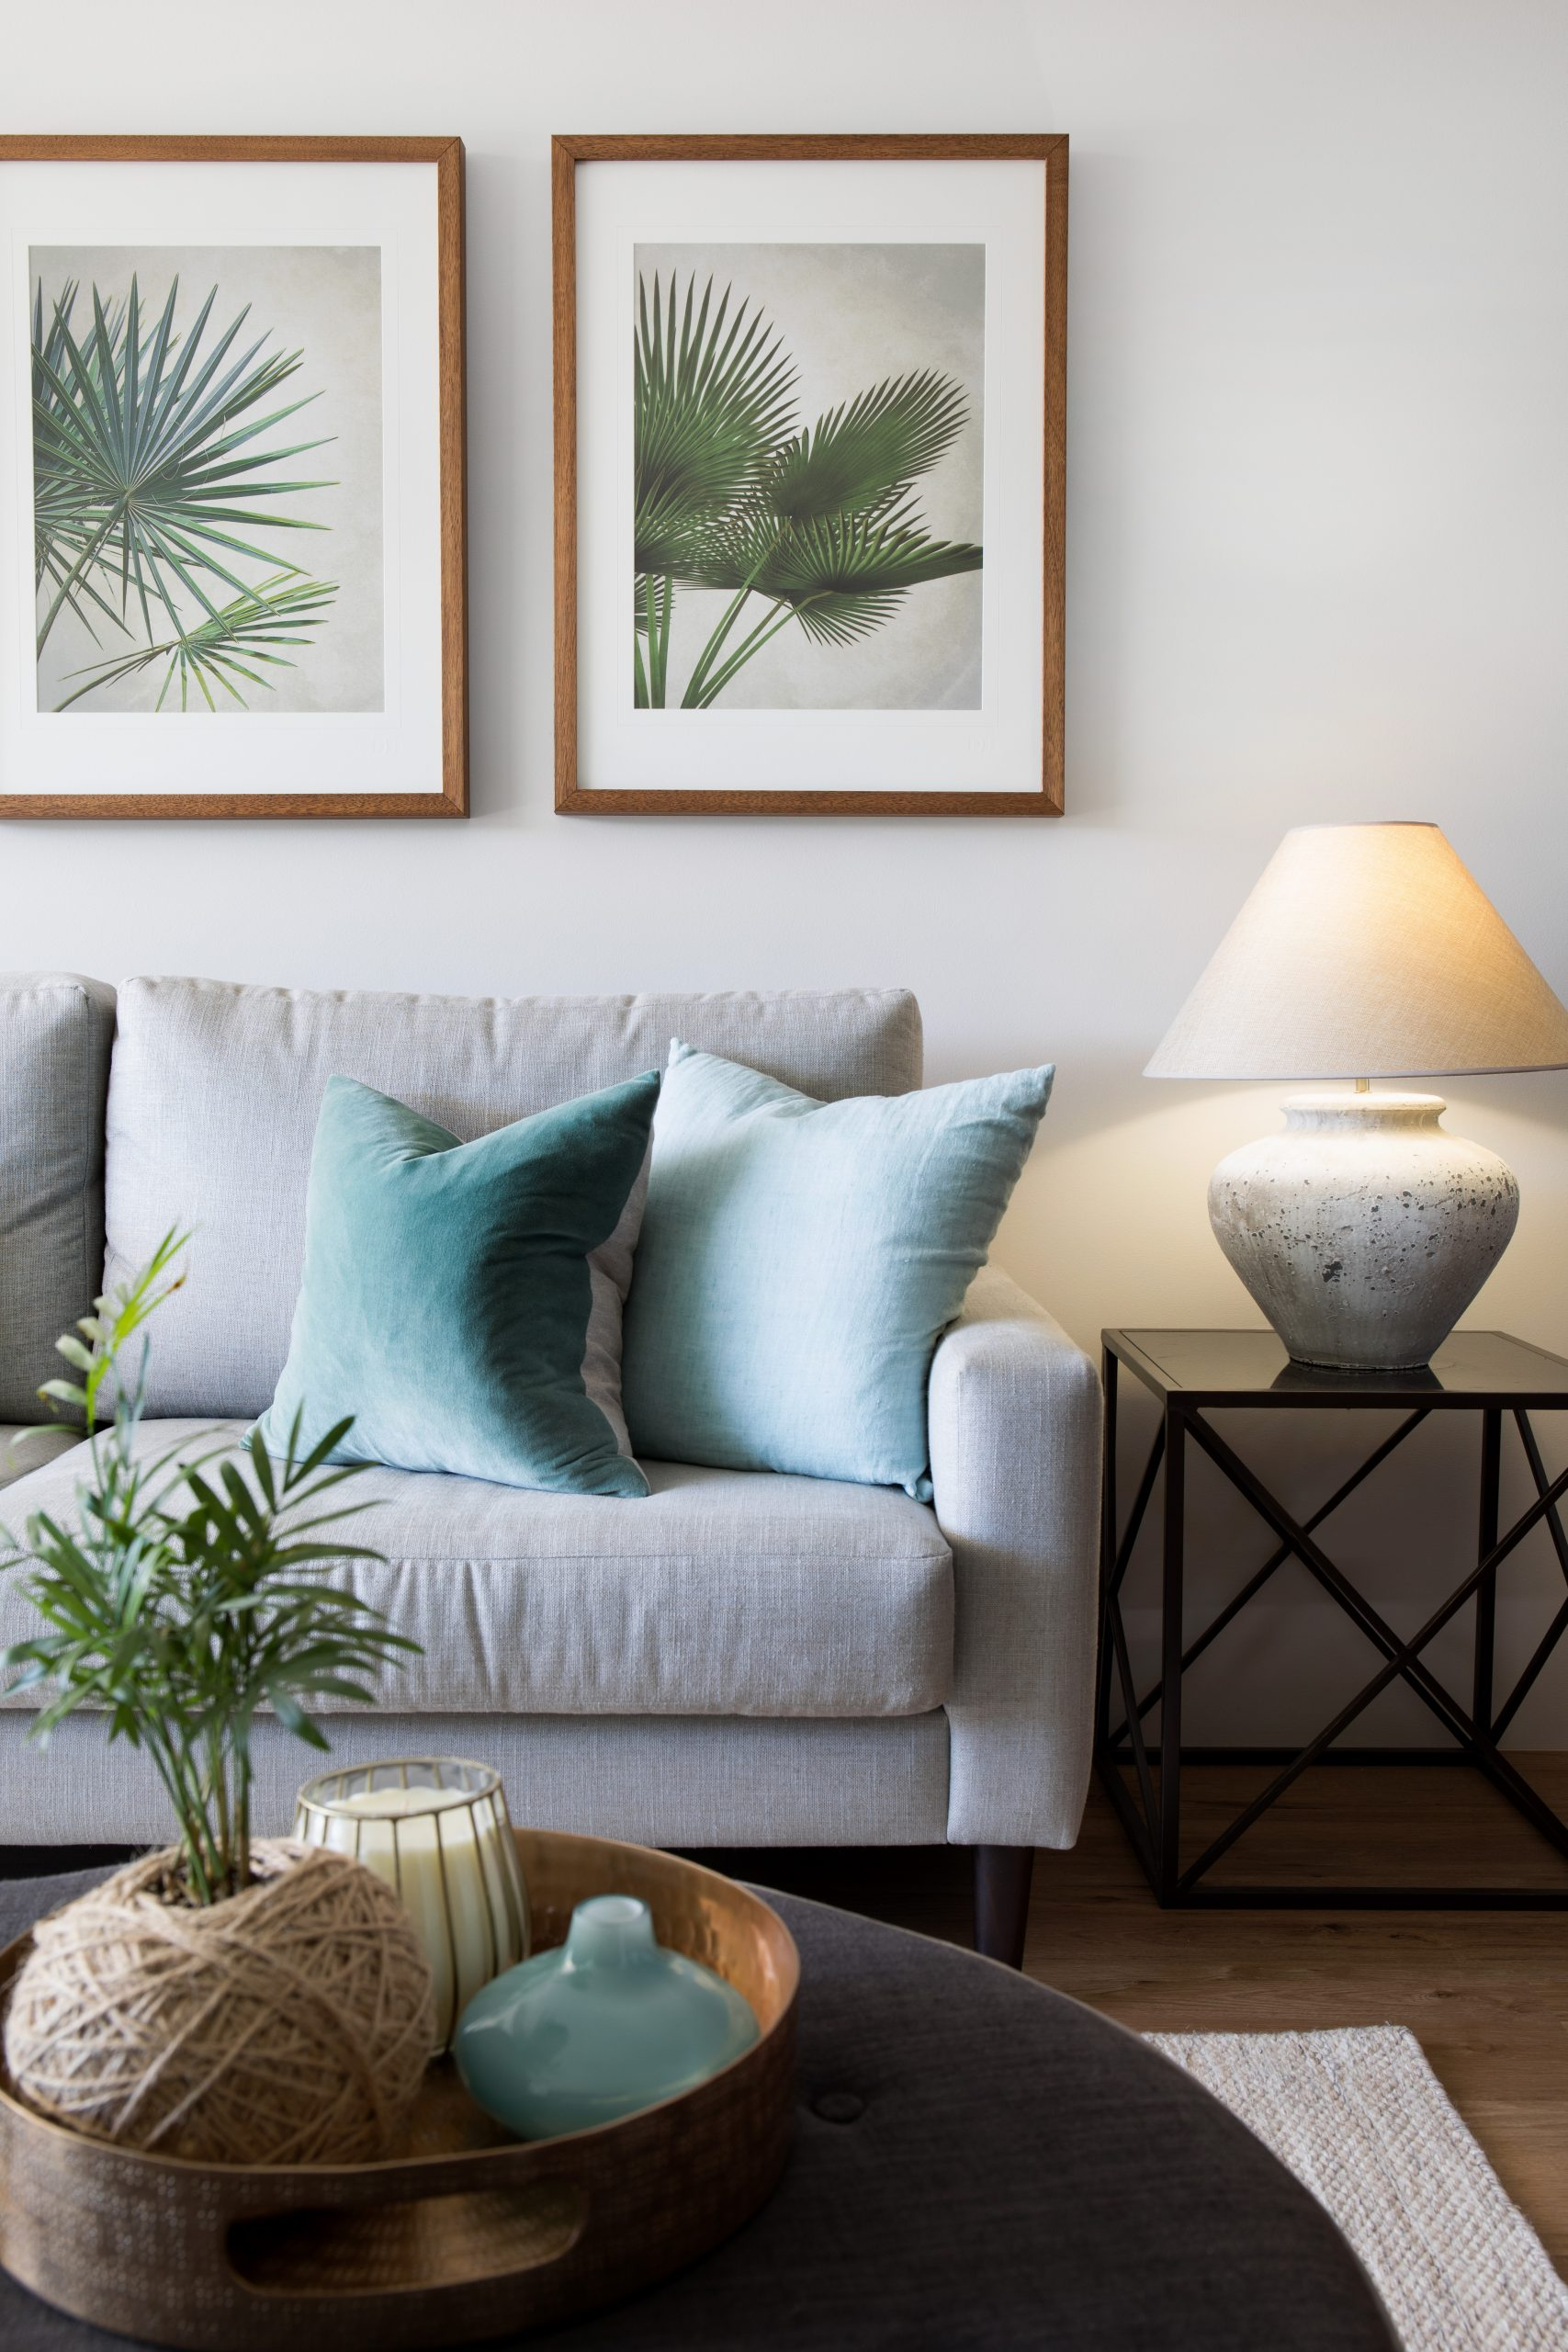 https://www.ivyandfinch.com.au/wp-content/uploads/2021/02/Roma-Street-Parklands-Interior-Design-Living-Room-scaled.jpg